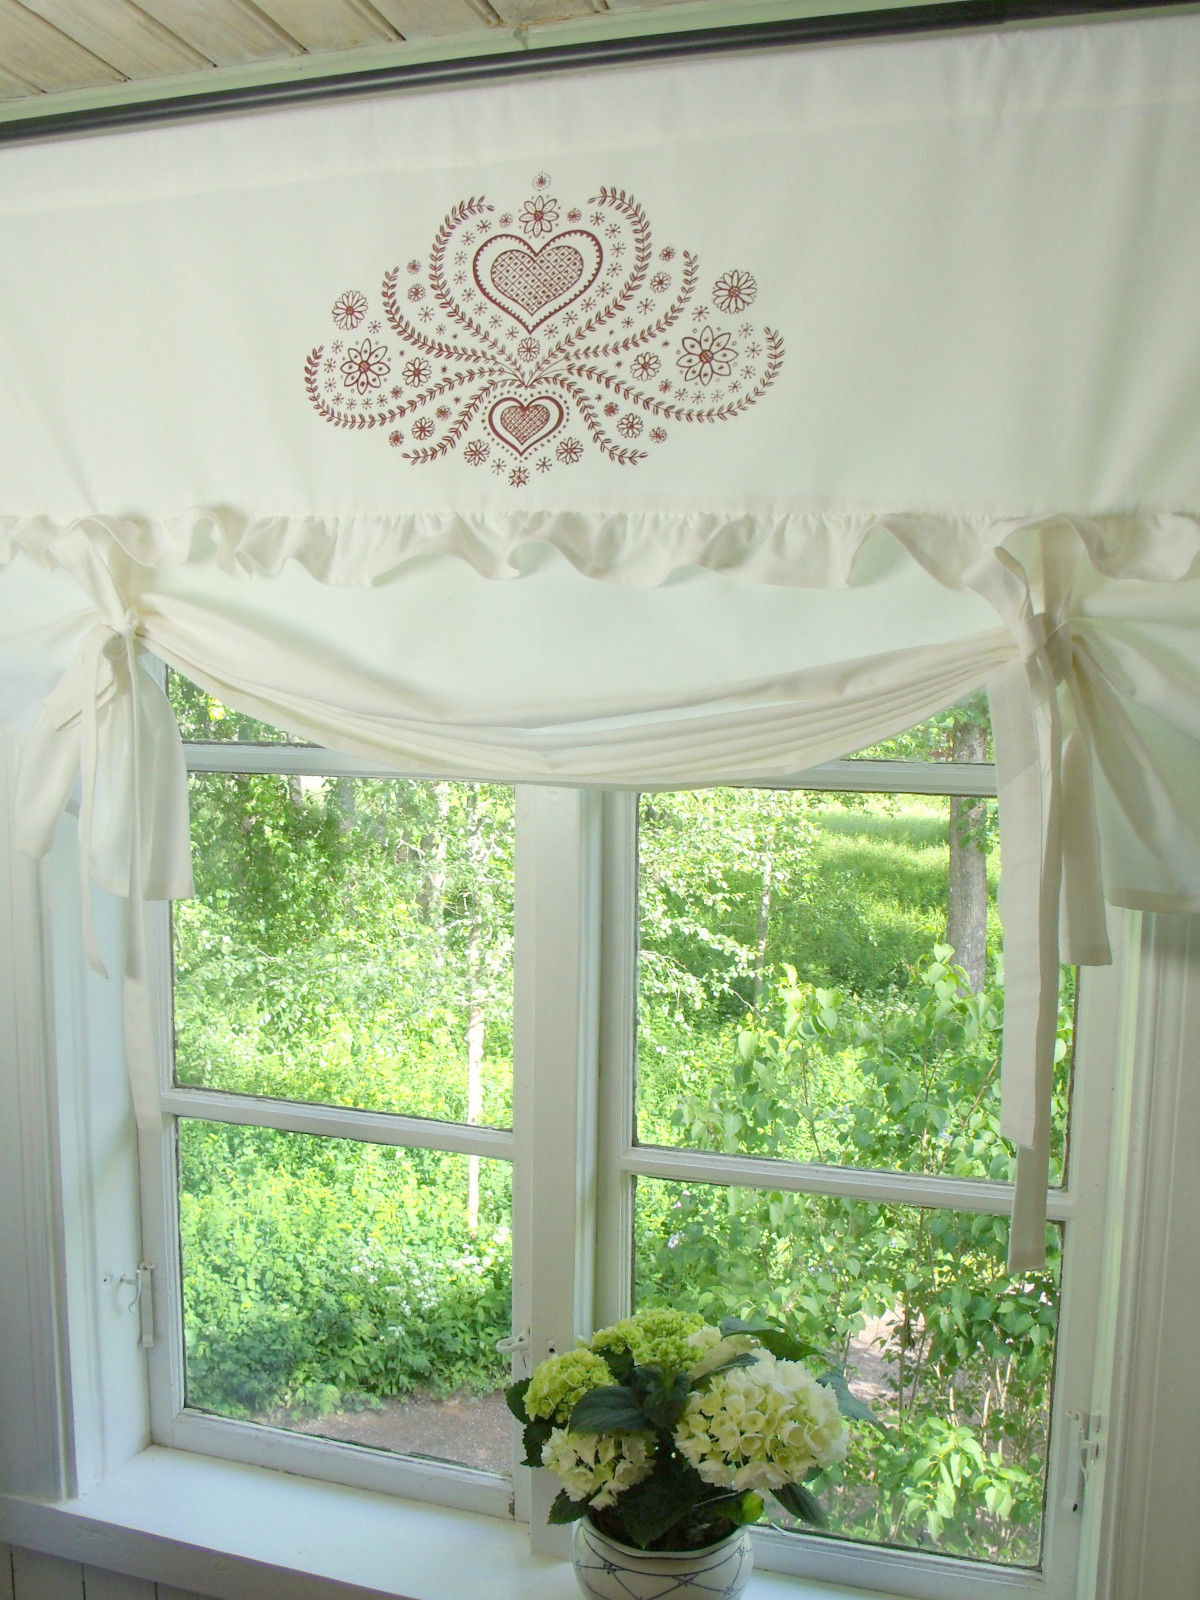 raff gardine herzig wei rot rollo 140x100 cm raffgardinen rollos gardinen lillabelle. Black Bedroom Furniture Sets. Home Design Ideas